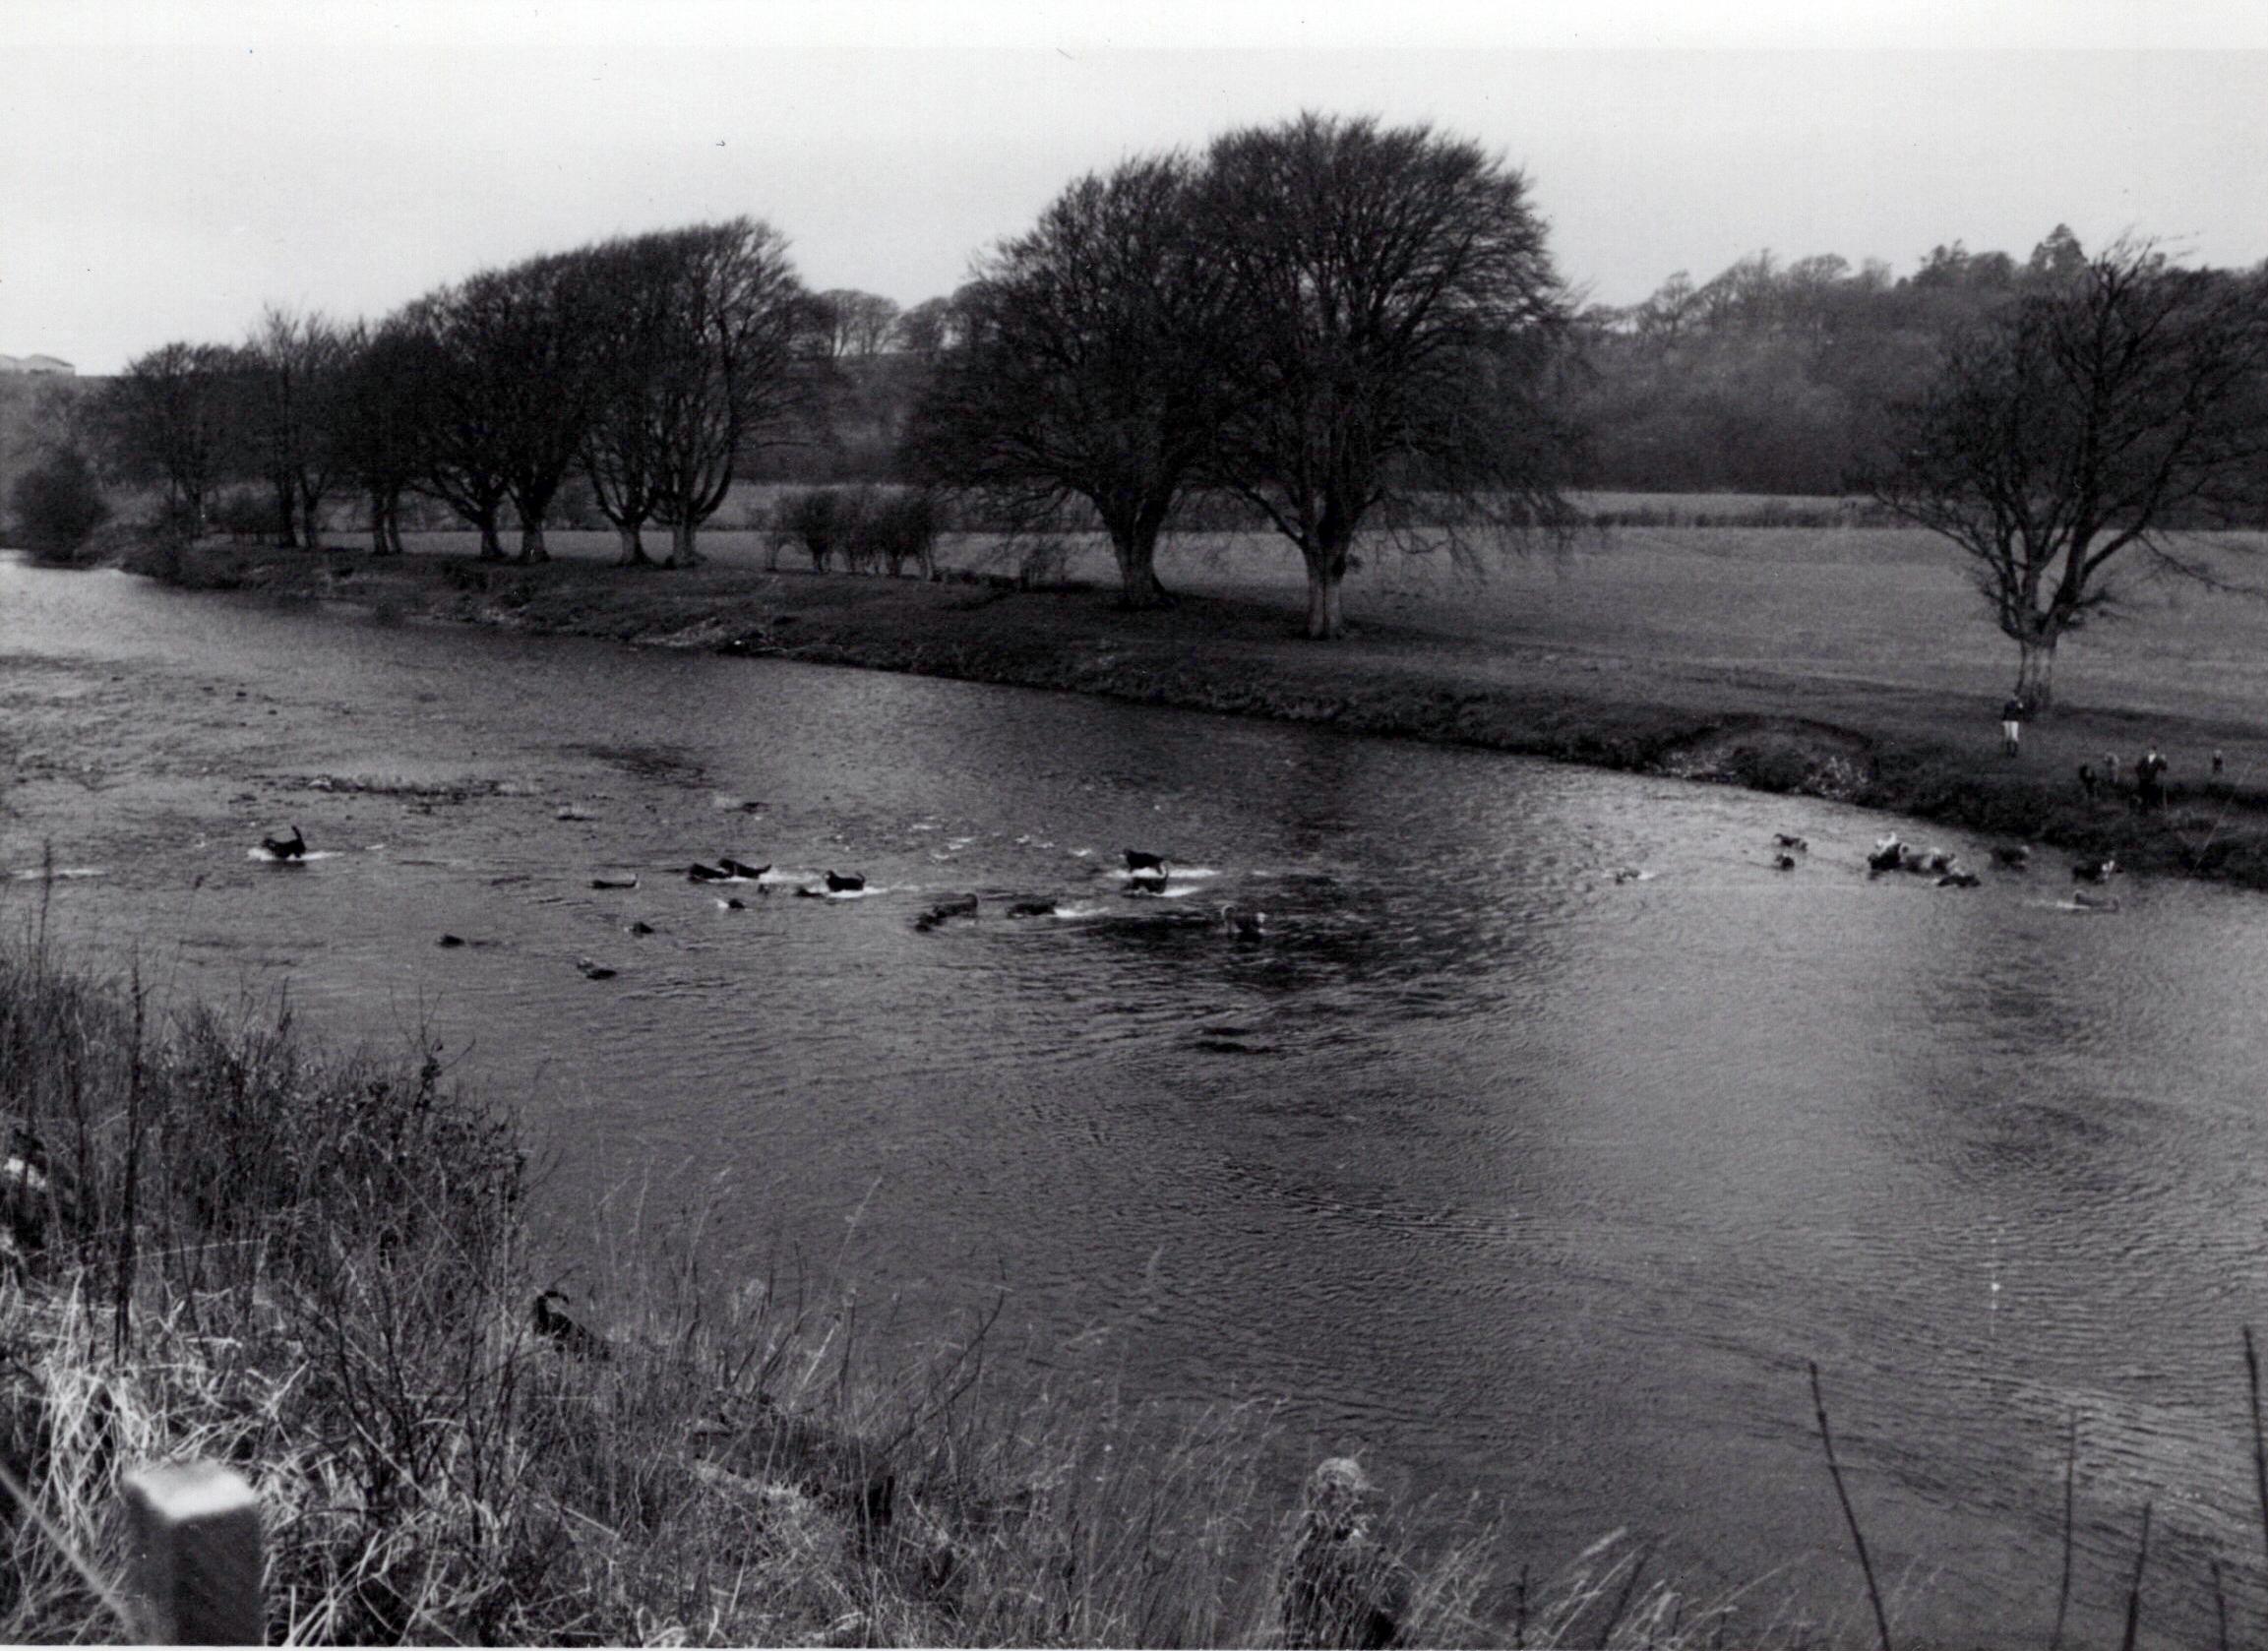 1970_Mei_Otterhound-Schotland_0020_a